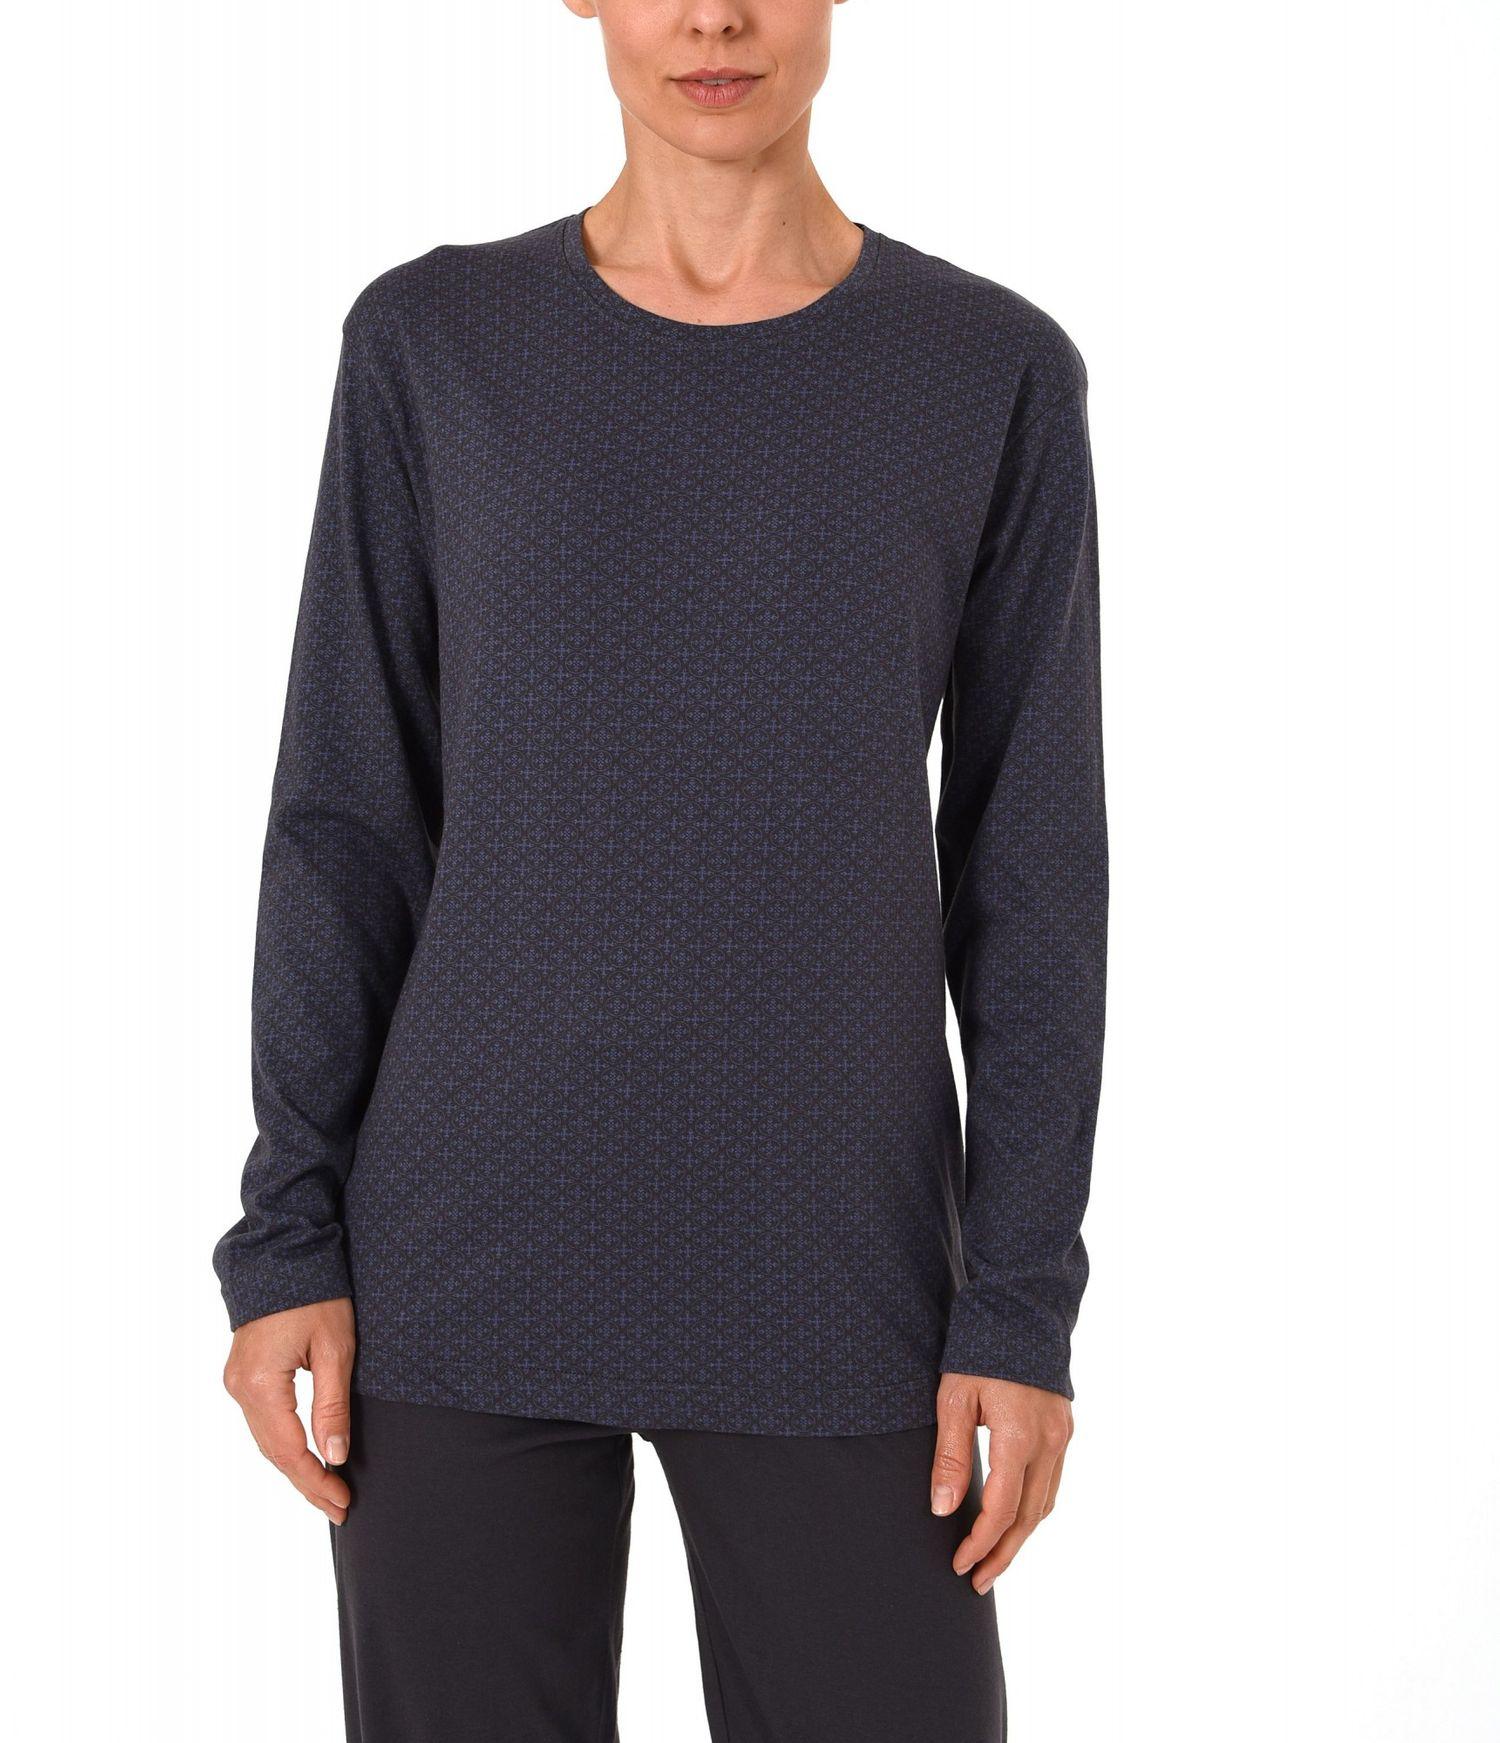 Damen Shirt - Oberteil langarm Mix & Match minimal Print  – 271 219 90 104 – Bild 4